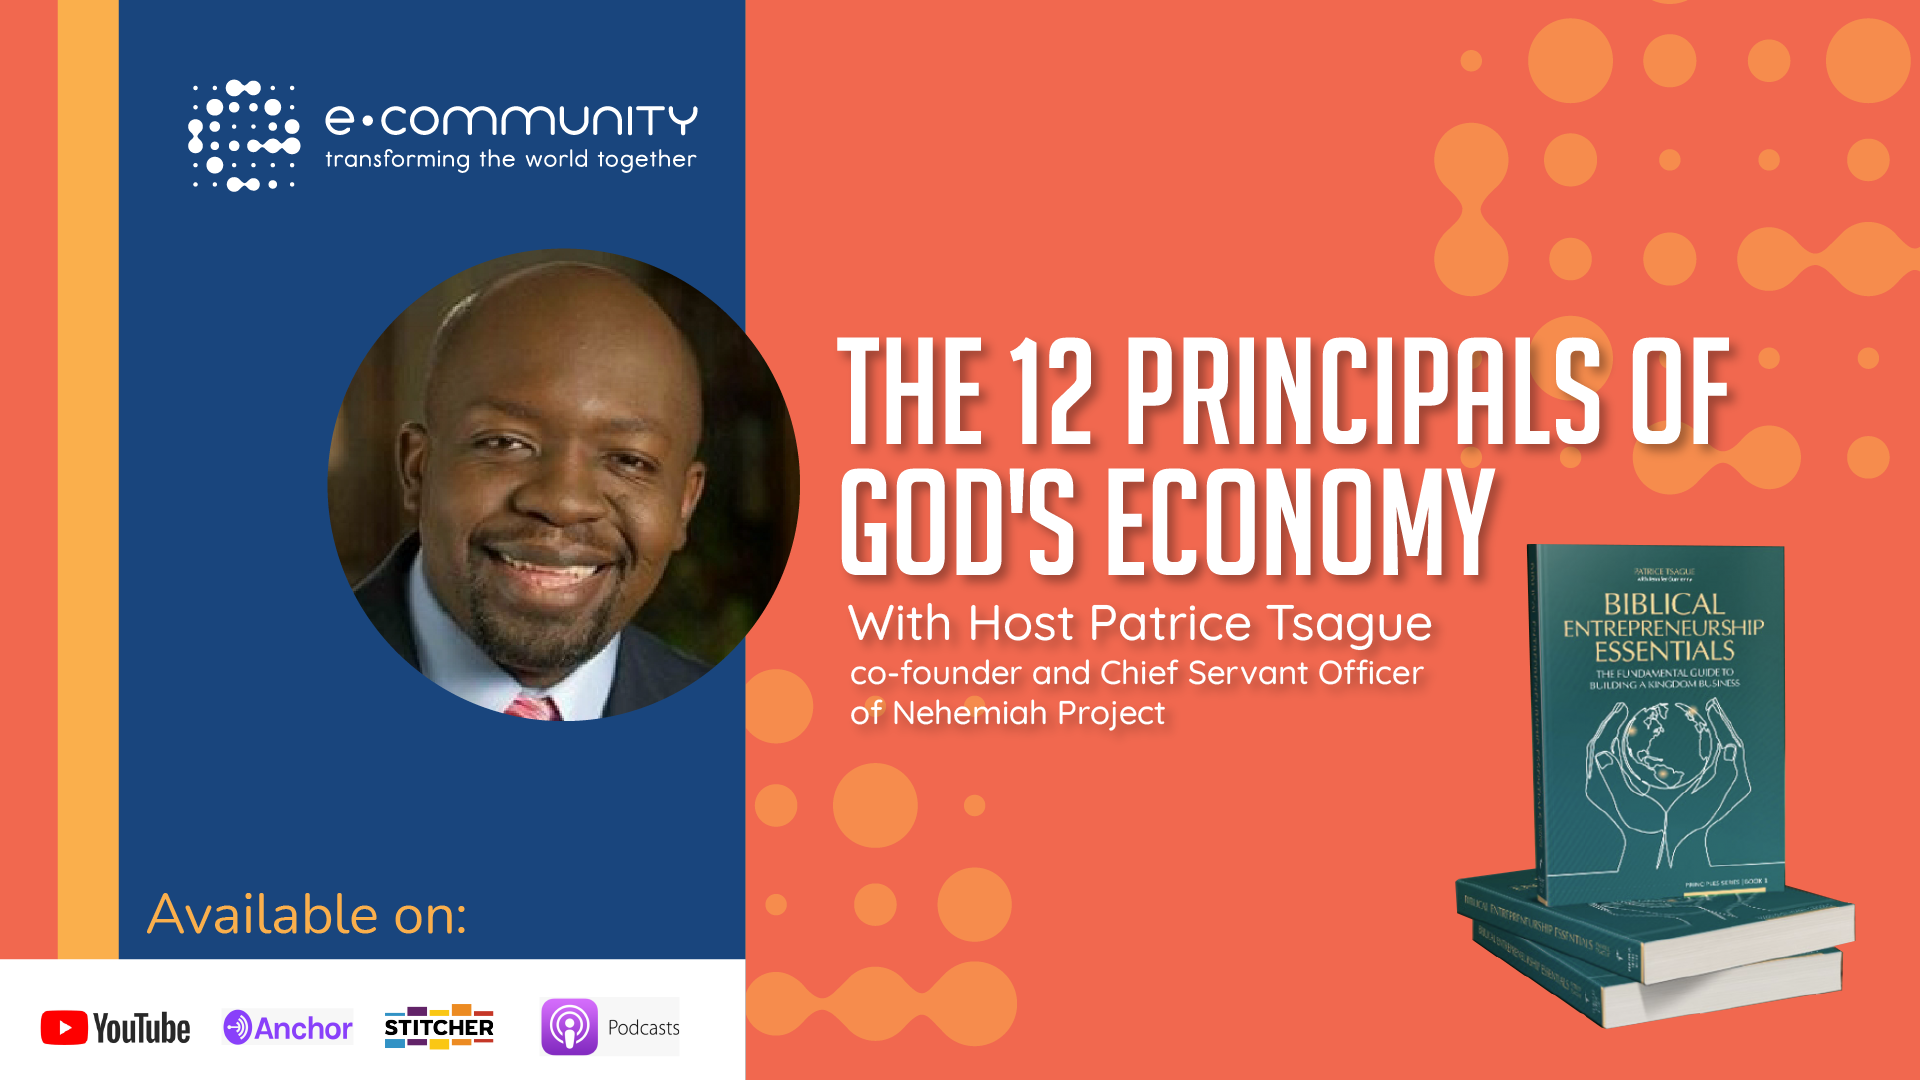 The 12 Principals of God's Economy